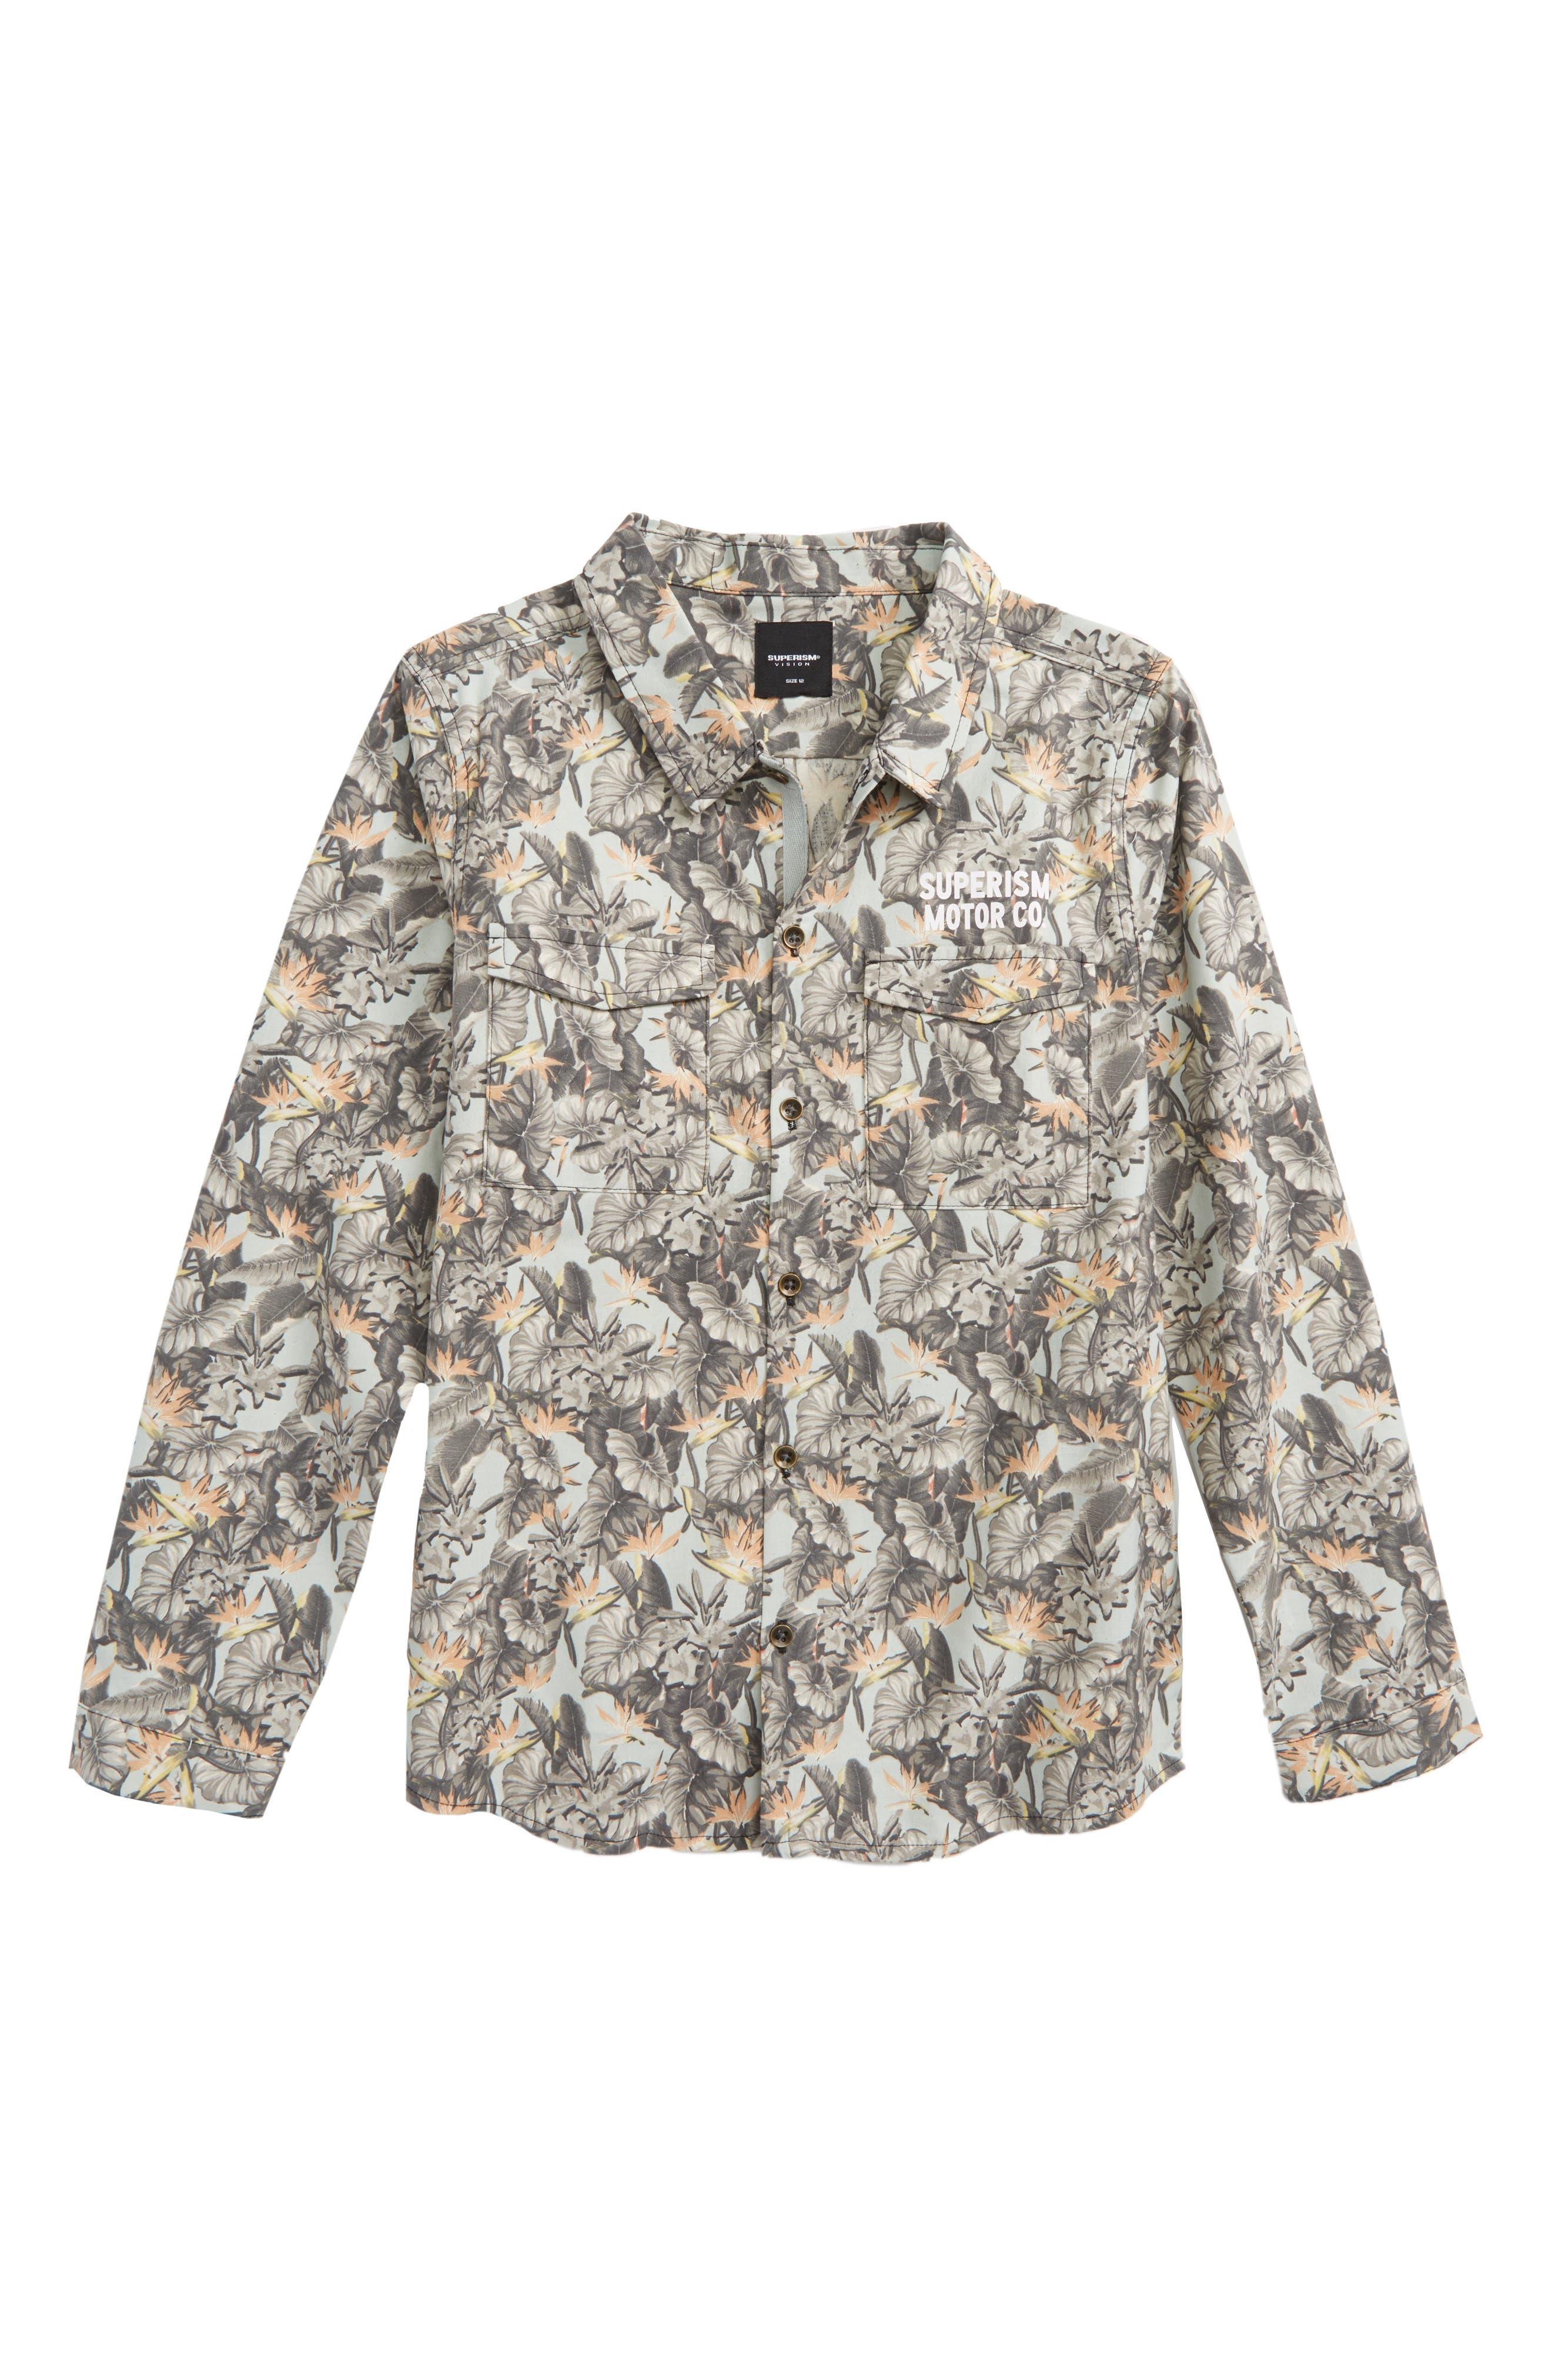 Alternate Image 1 Selected - Superism Eli Woven Shirt (Big Boys)